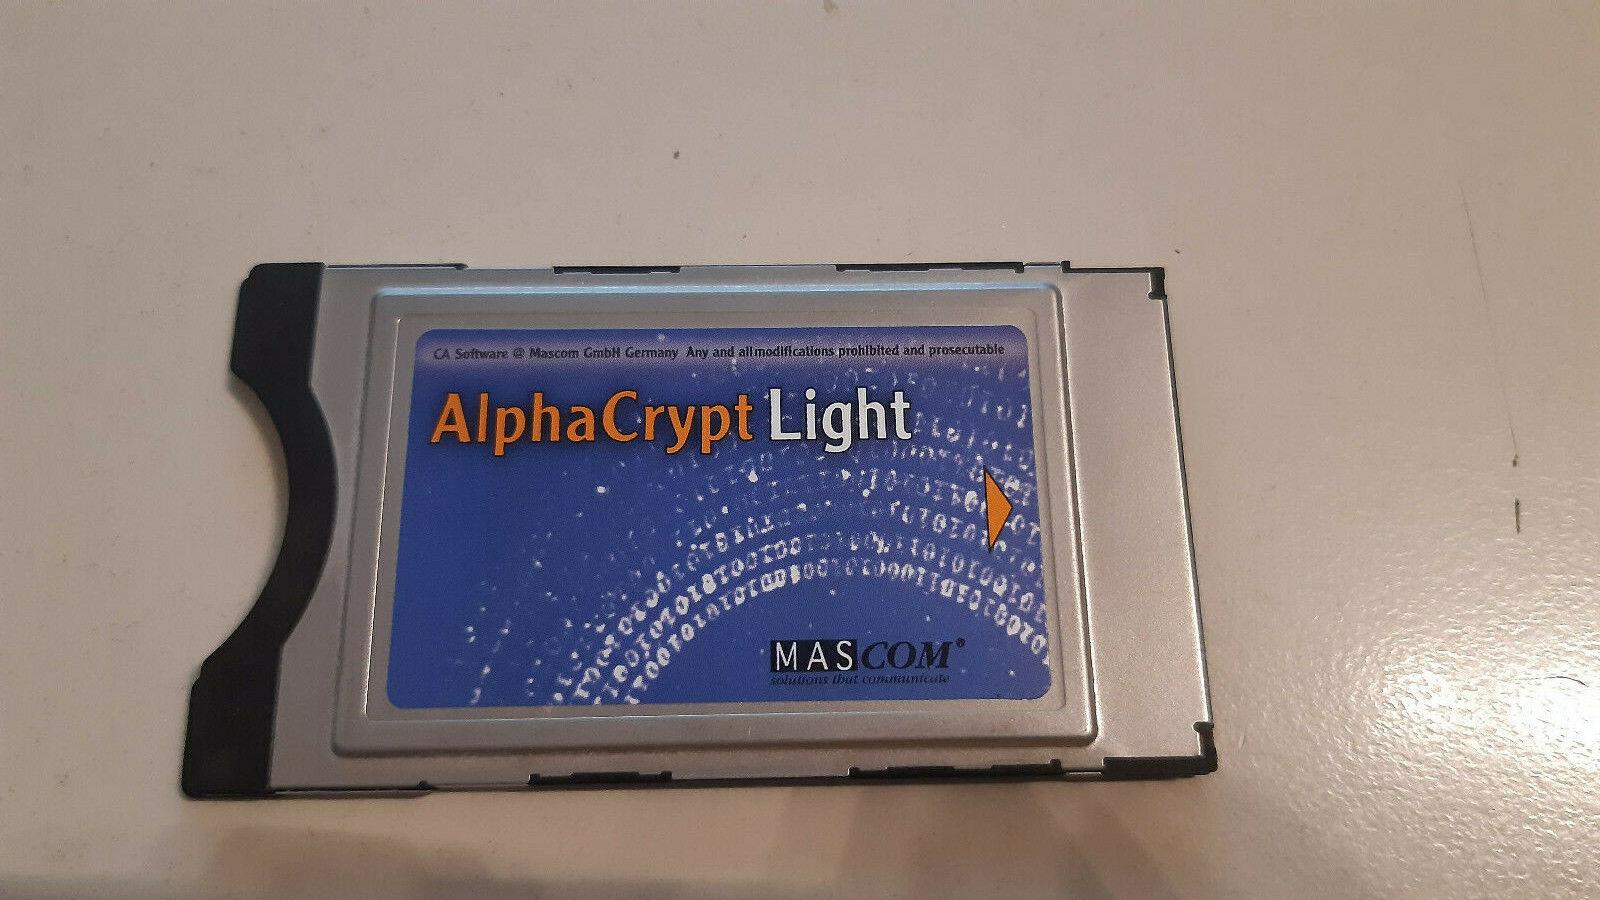 AlphaCrypt Version R2.2 Light CI Modul Version R2.6